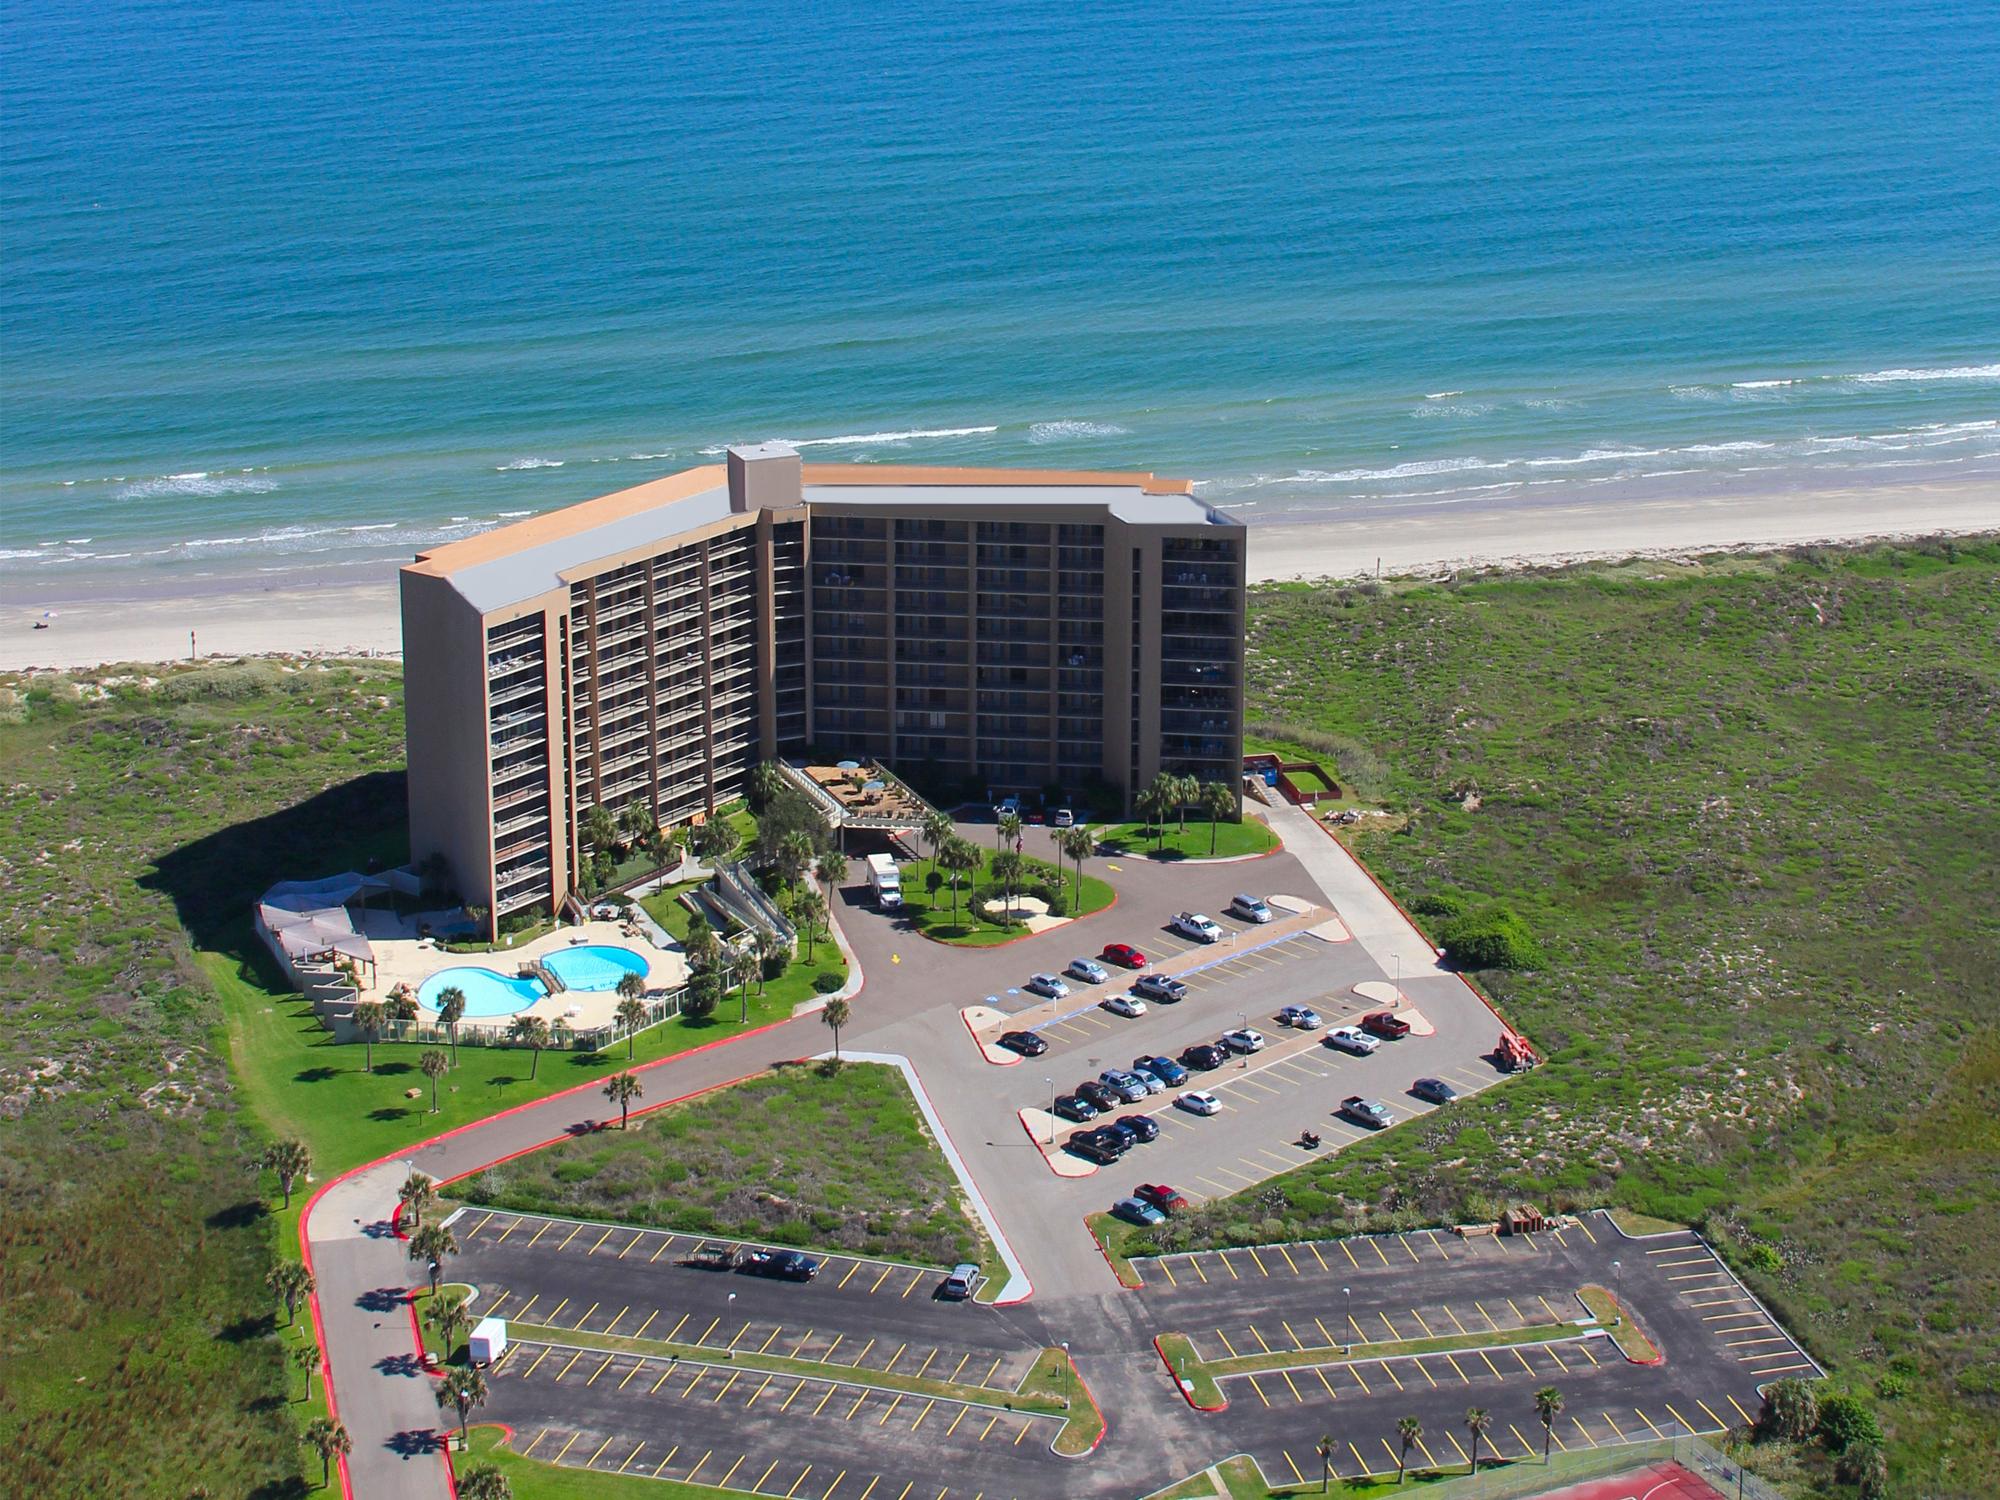 Port Aransas Beachfront Resorts   Portaransas-Texas - Map Of Hotels In Port Aransas Texas